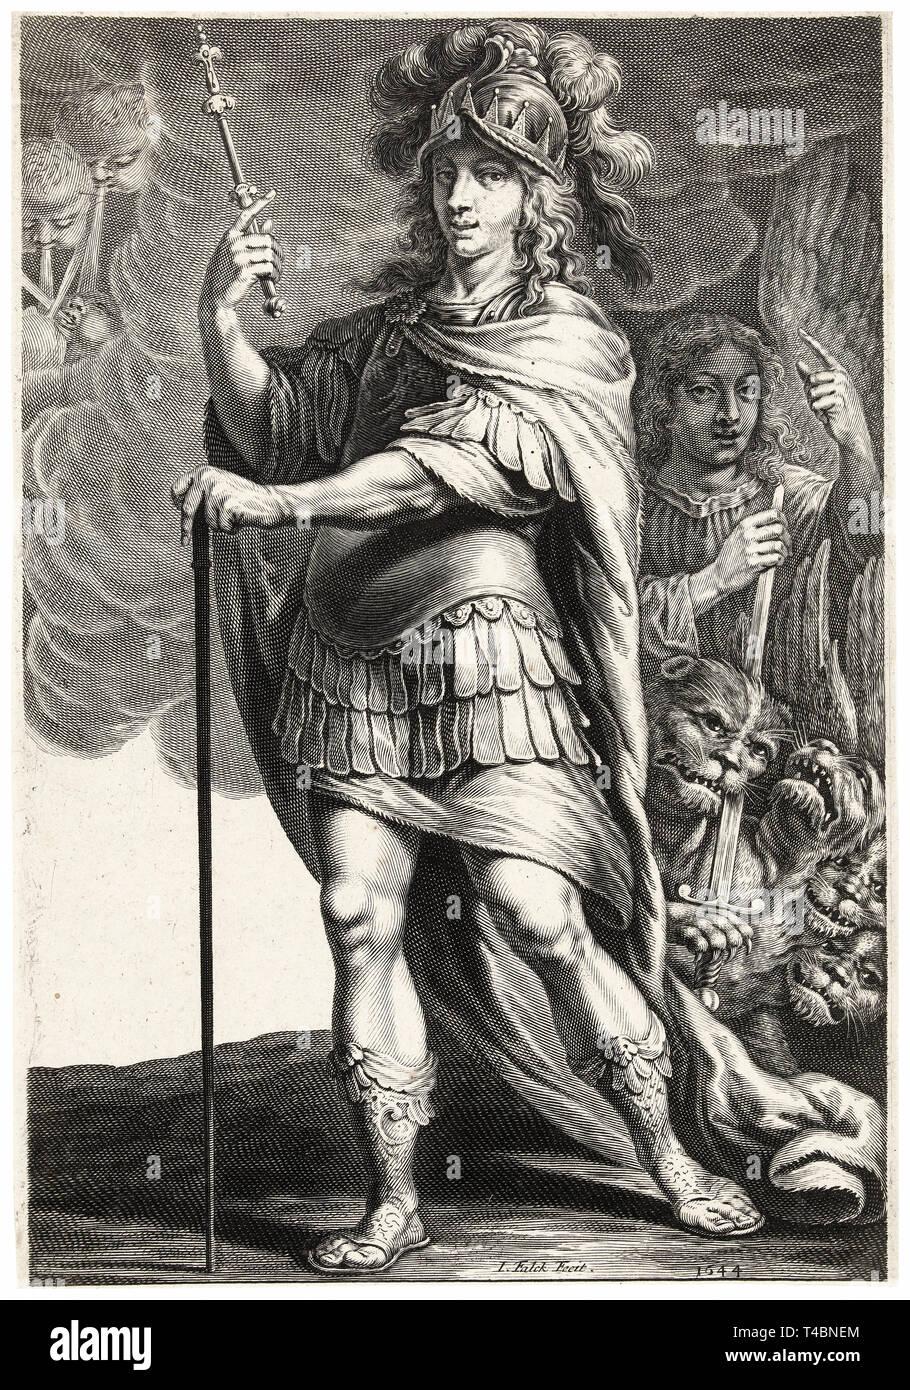 Alexander the Great, Jeremias Falck, after Claude Vignon, engraving, 1644 - Stock Image